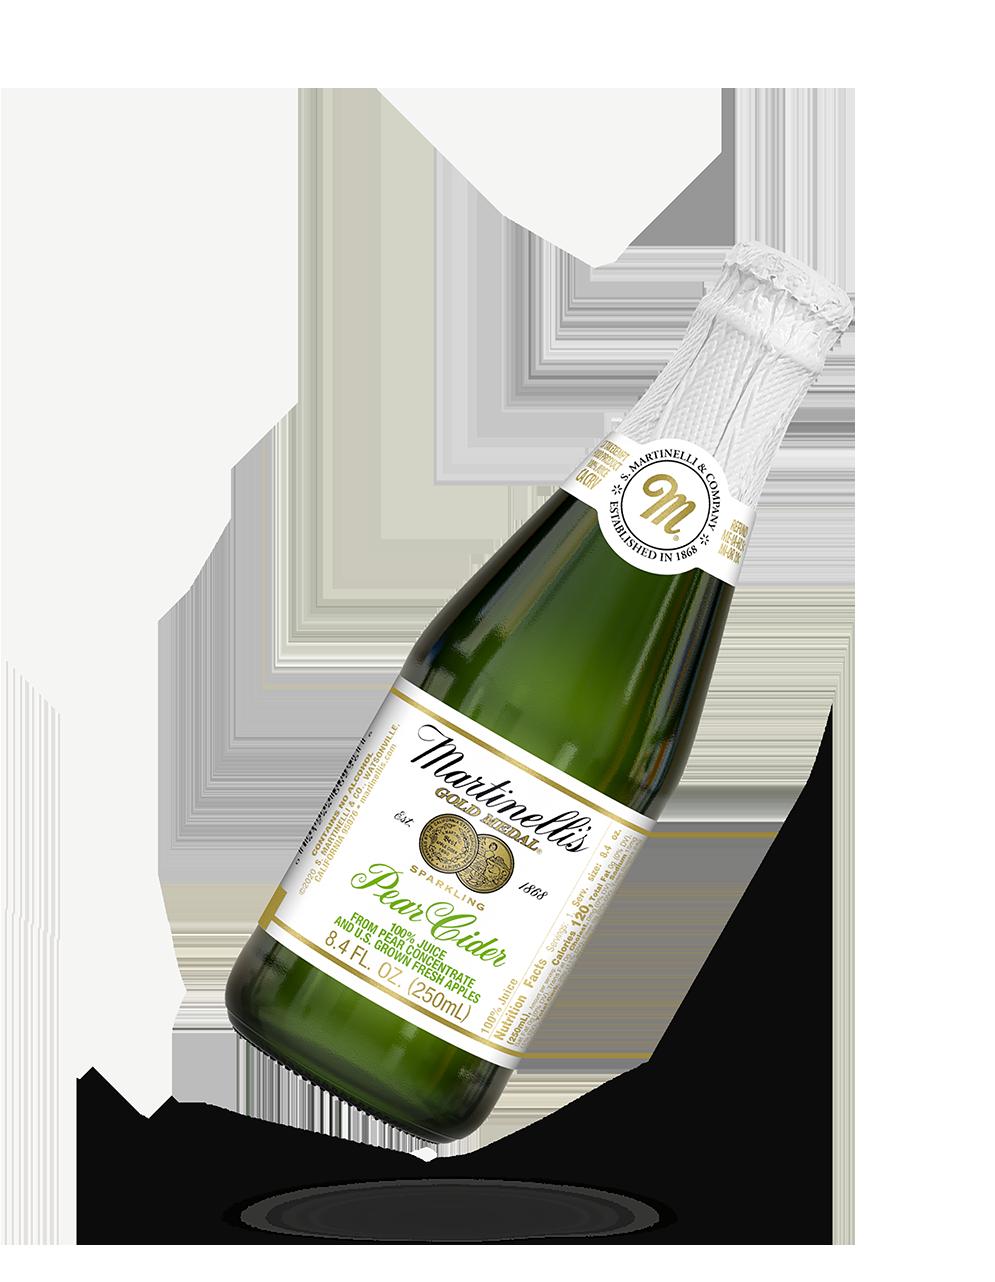 Sparkling Pear Cider 8.4 fl. oz.